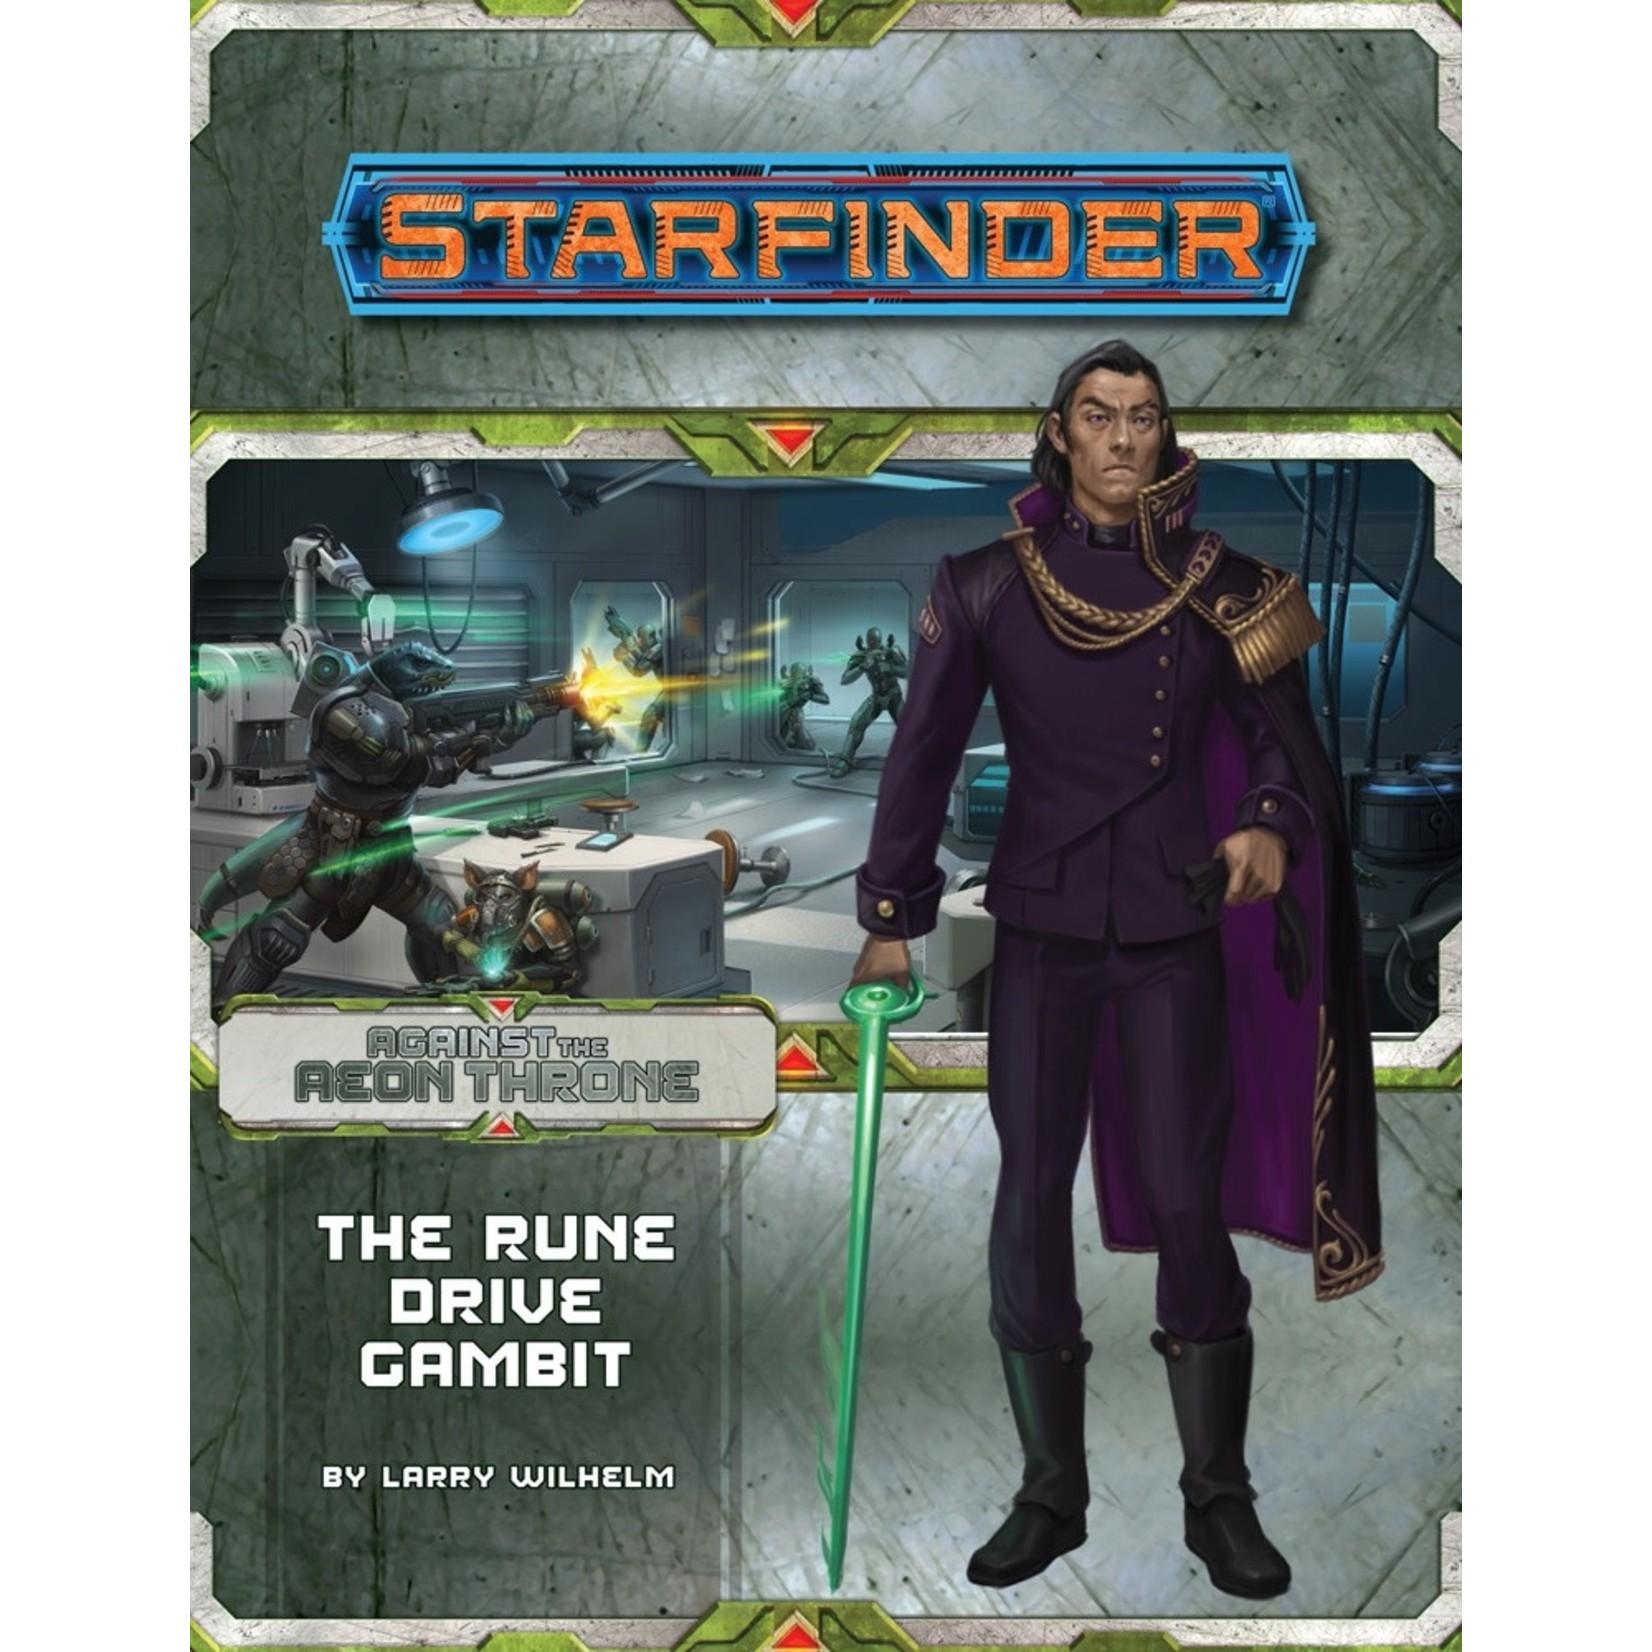 Starfinder RPG Adventure Path #9 Against the Aeon Throne: The Rune Drive Gambit